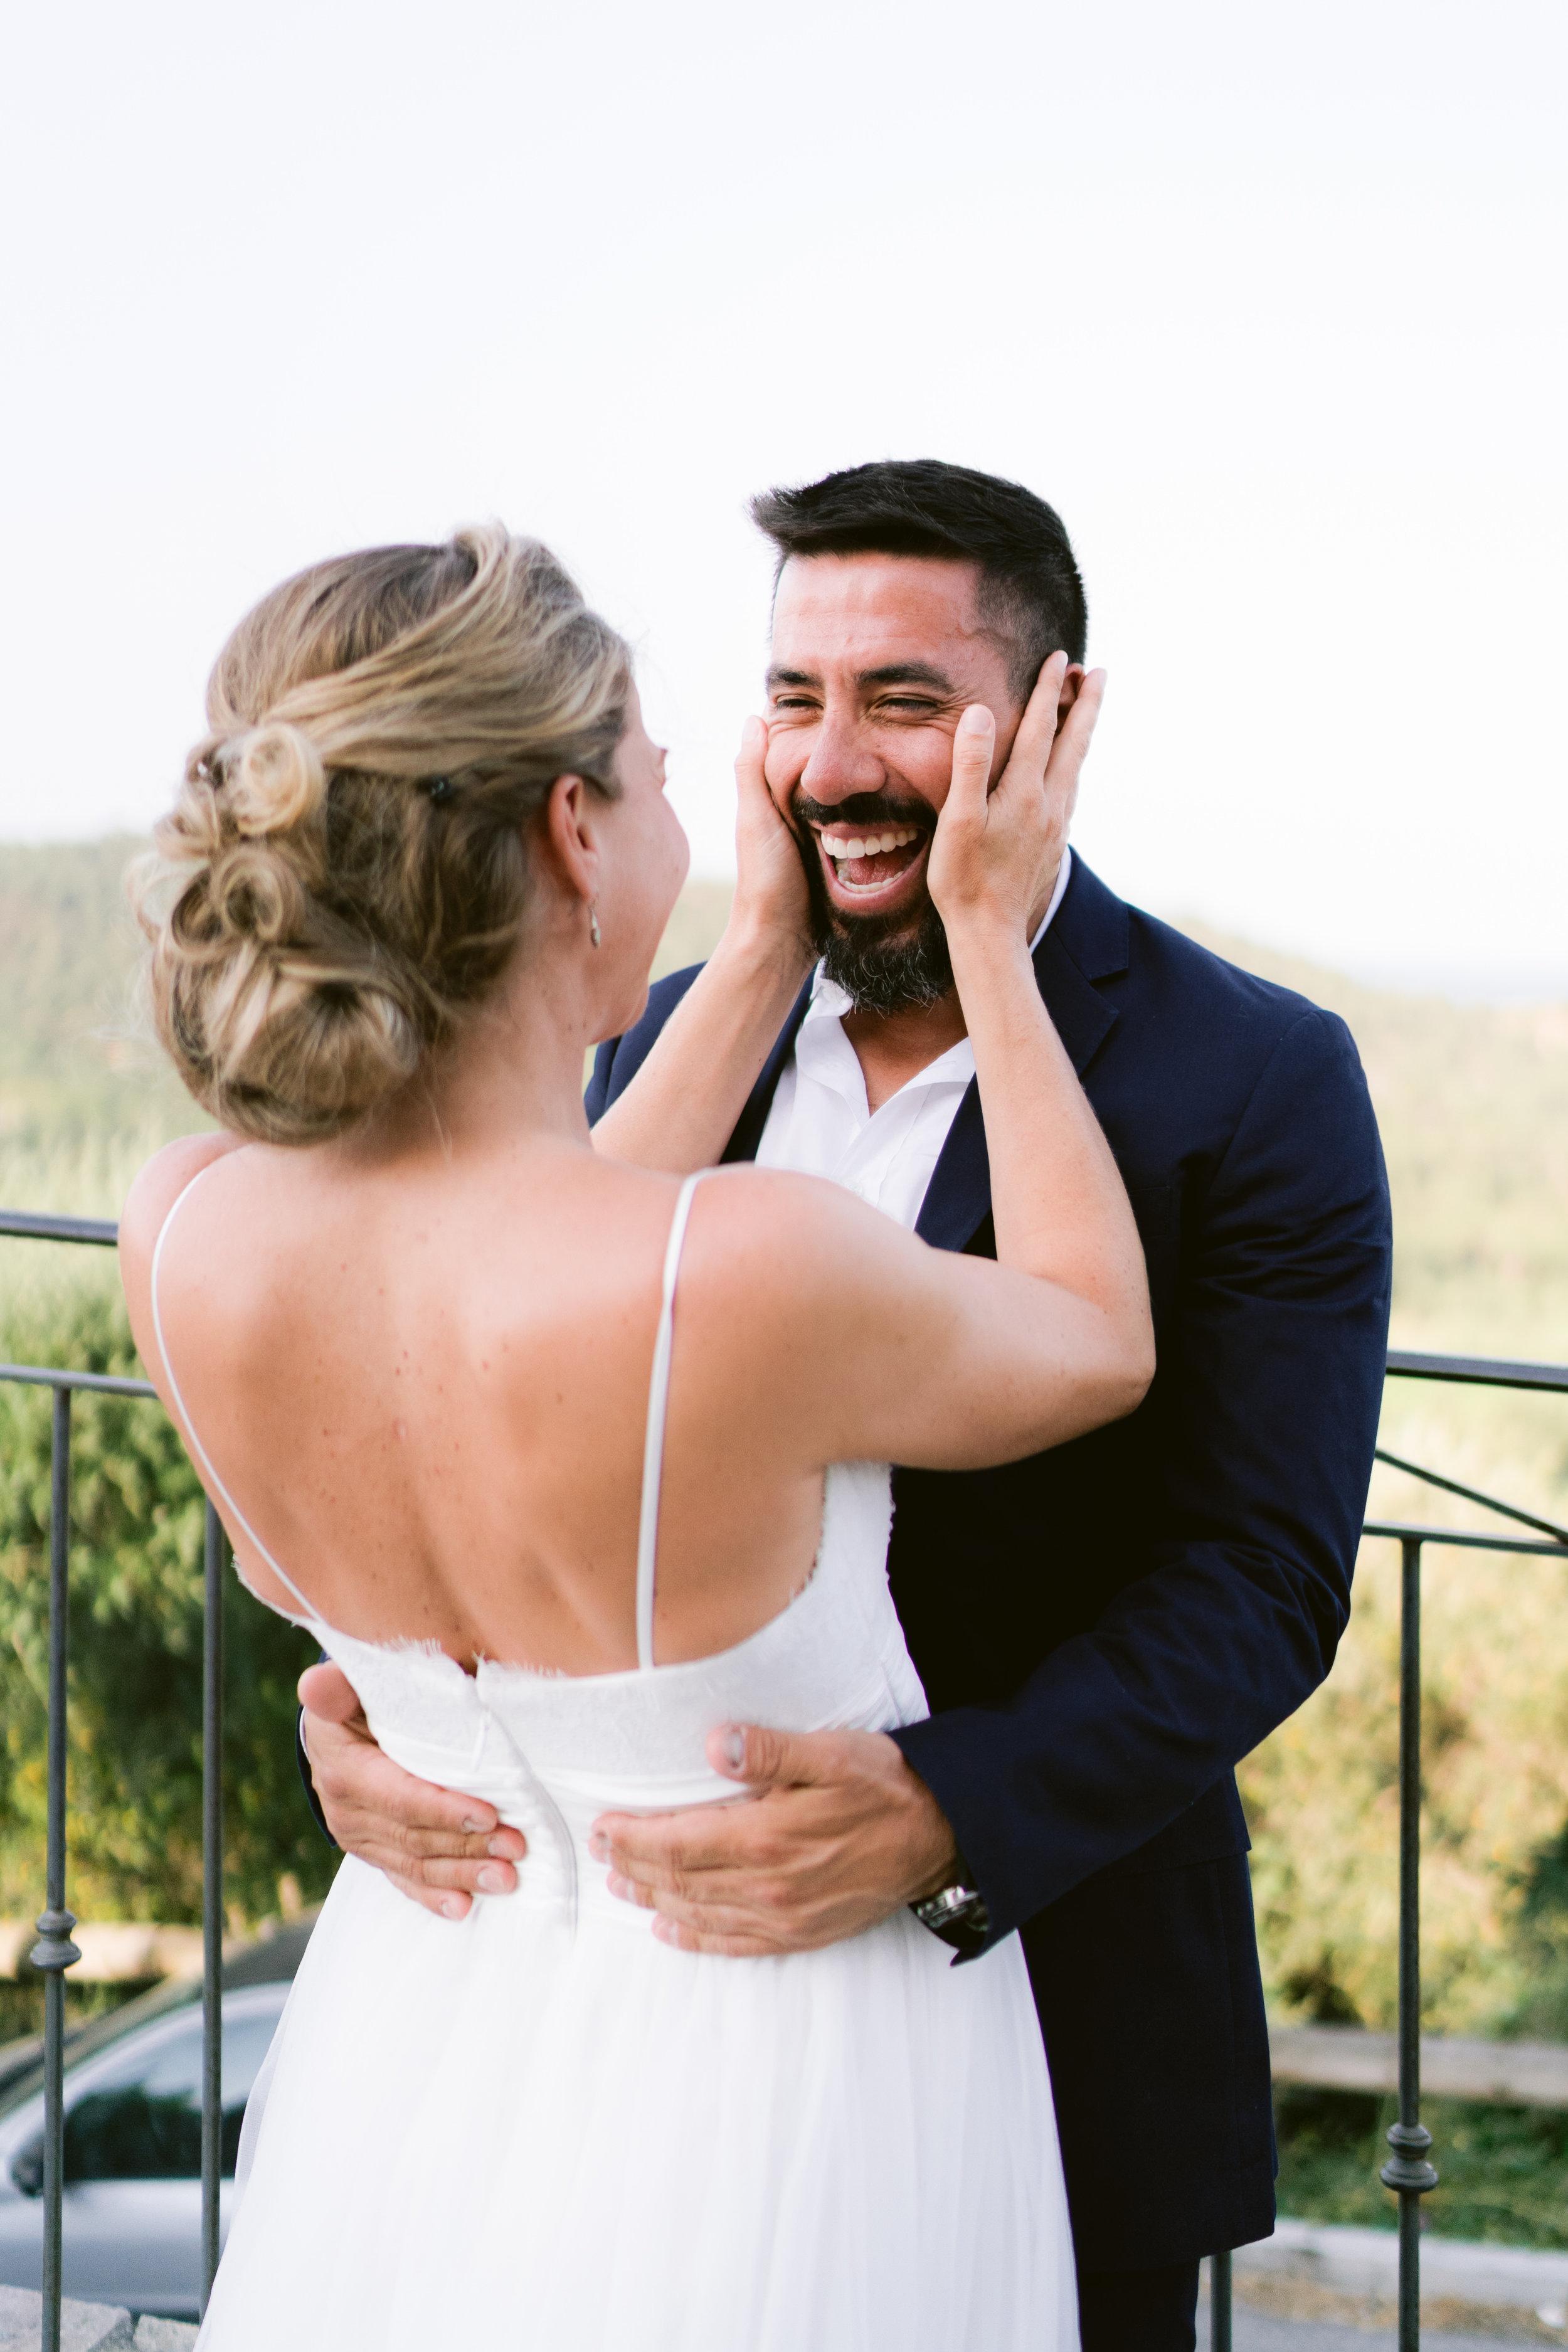 english photographer in france, wedding photographer saint tropez, romantic wedding photography france, chateau wedding france, cote d'azur wedding photographer, ramatuelle wedding (3).jpg